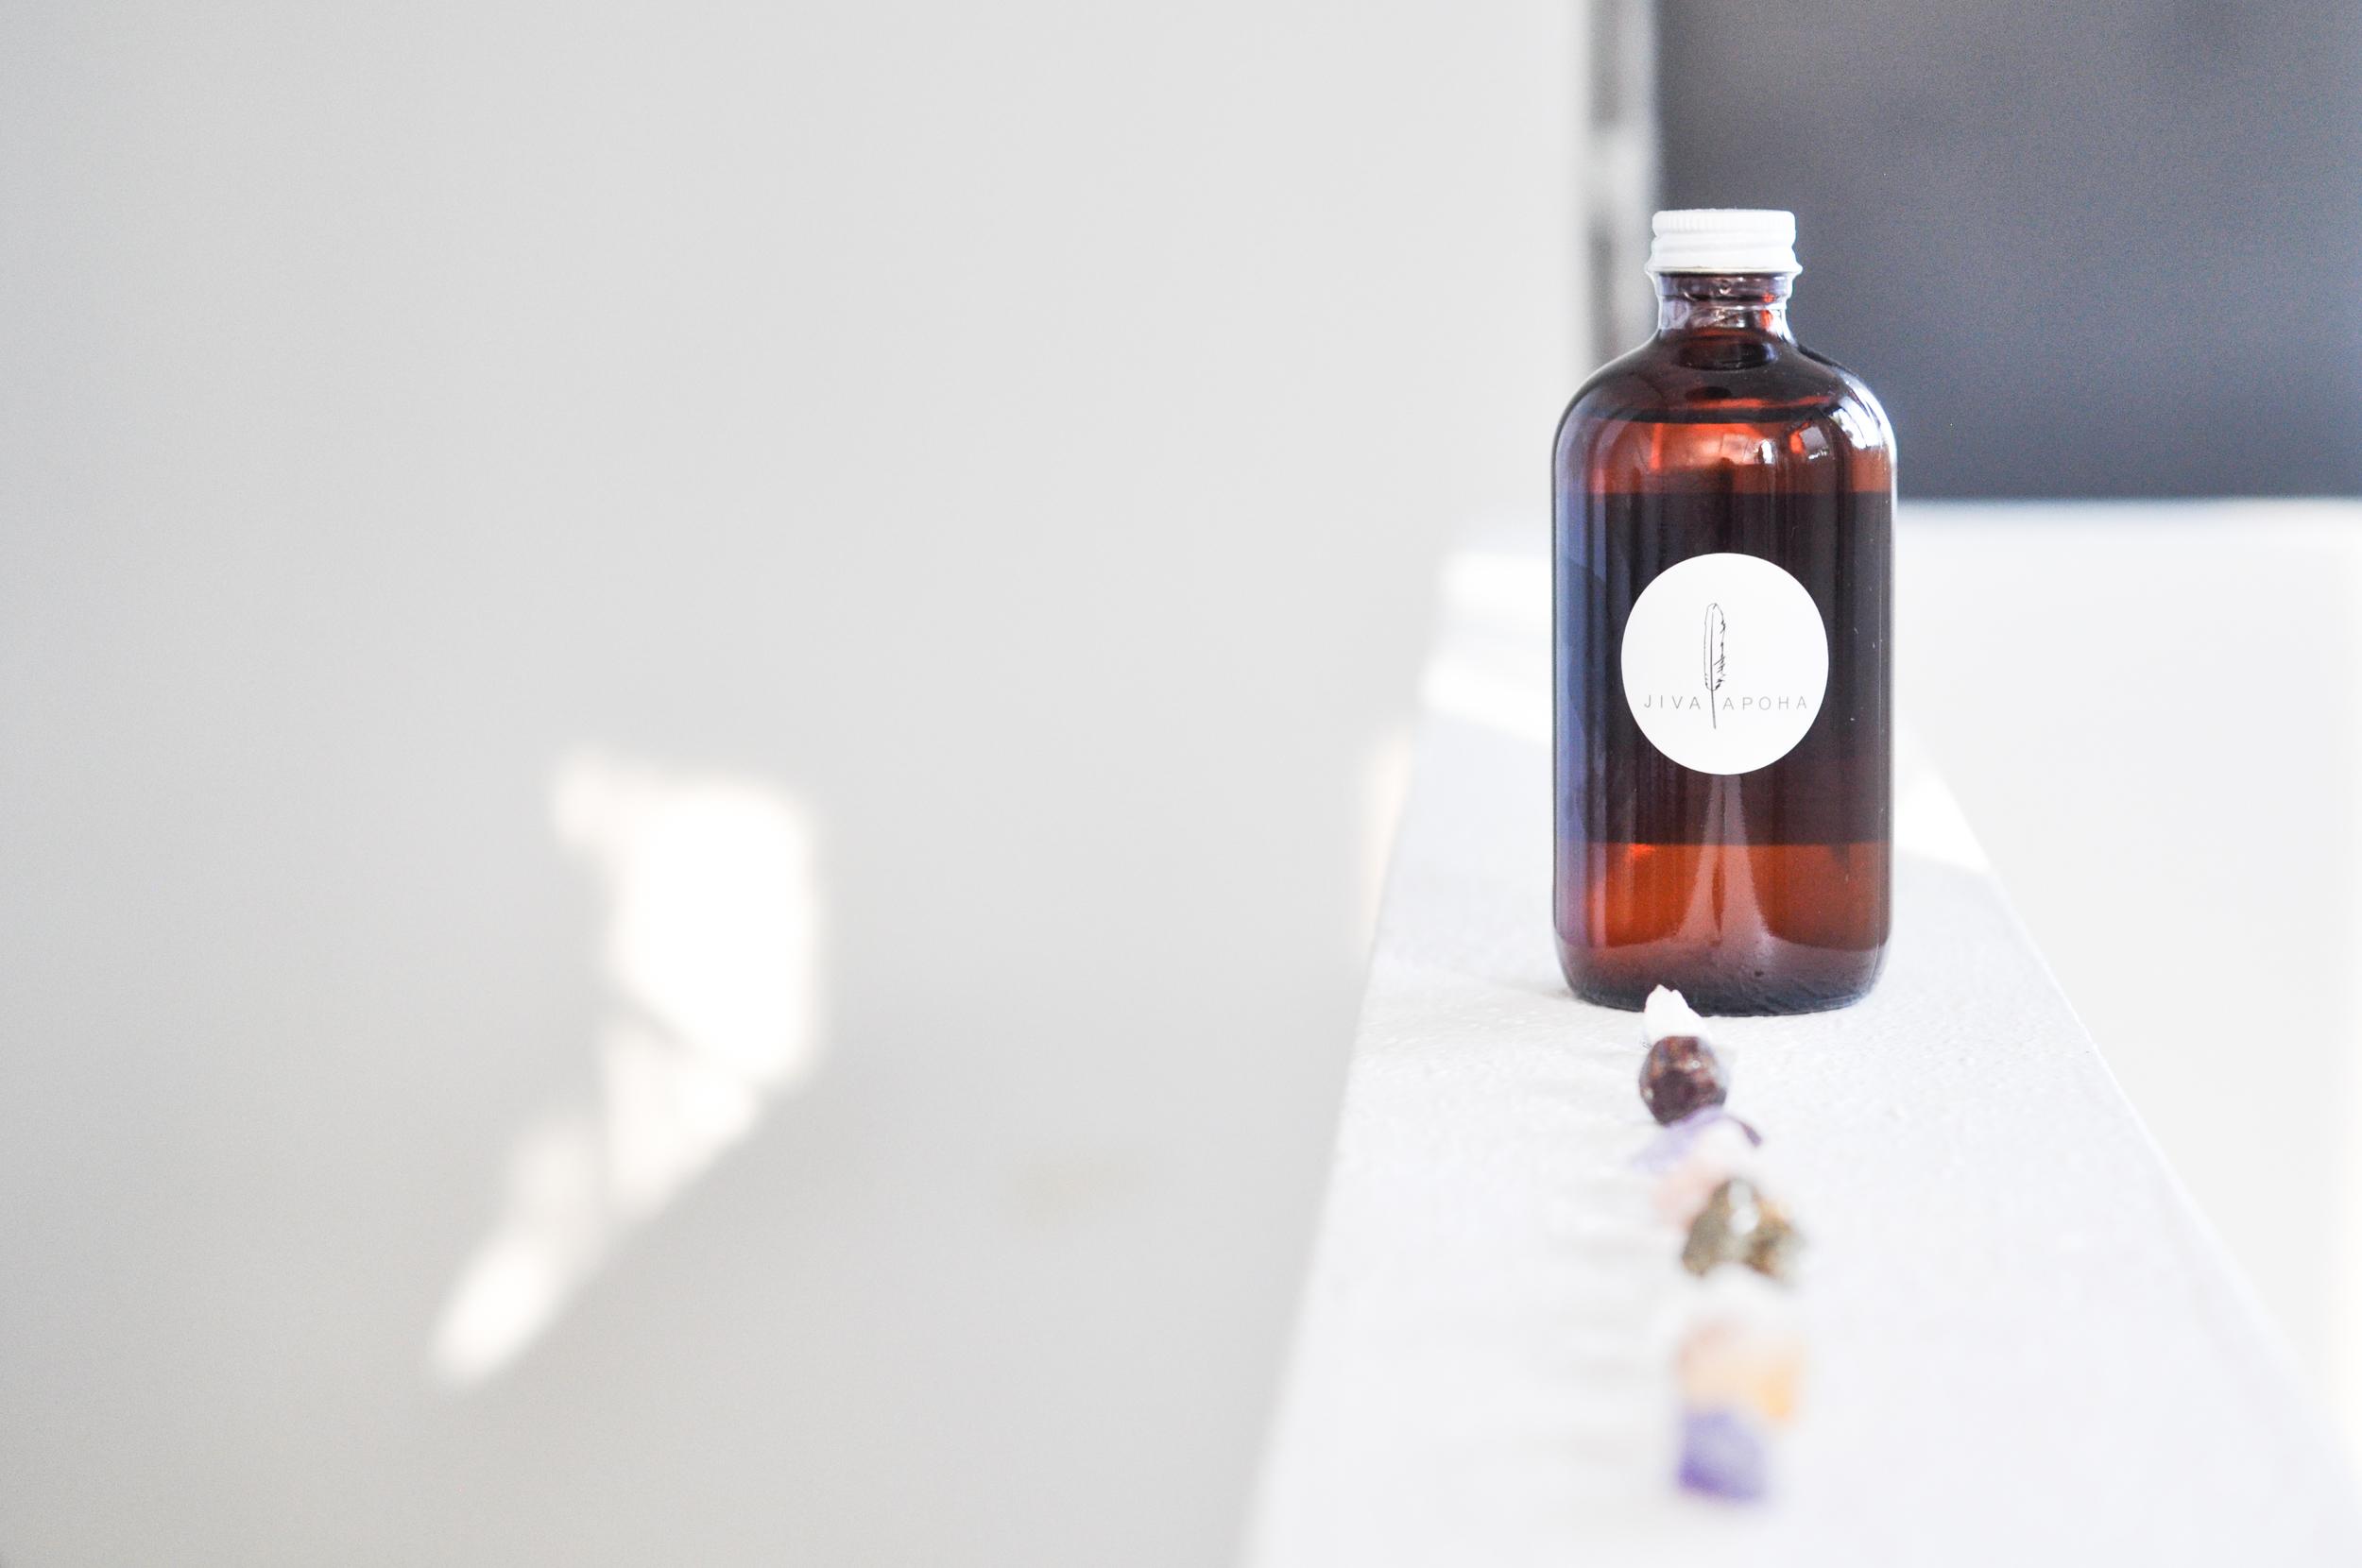 free-and-native-jiva apoha-oil